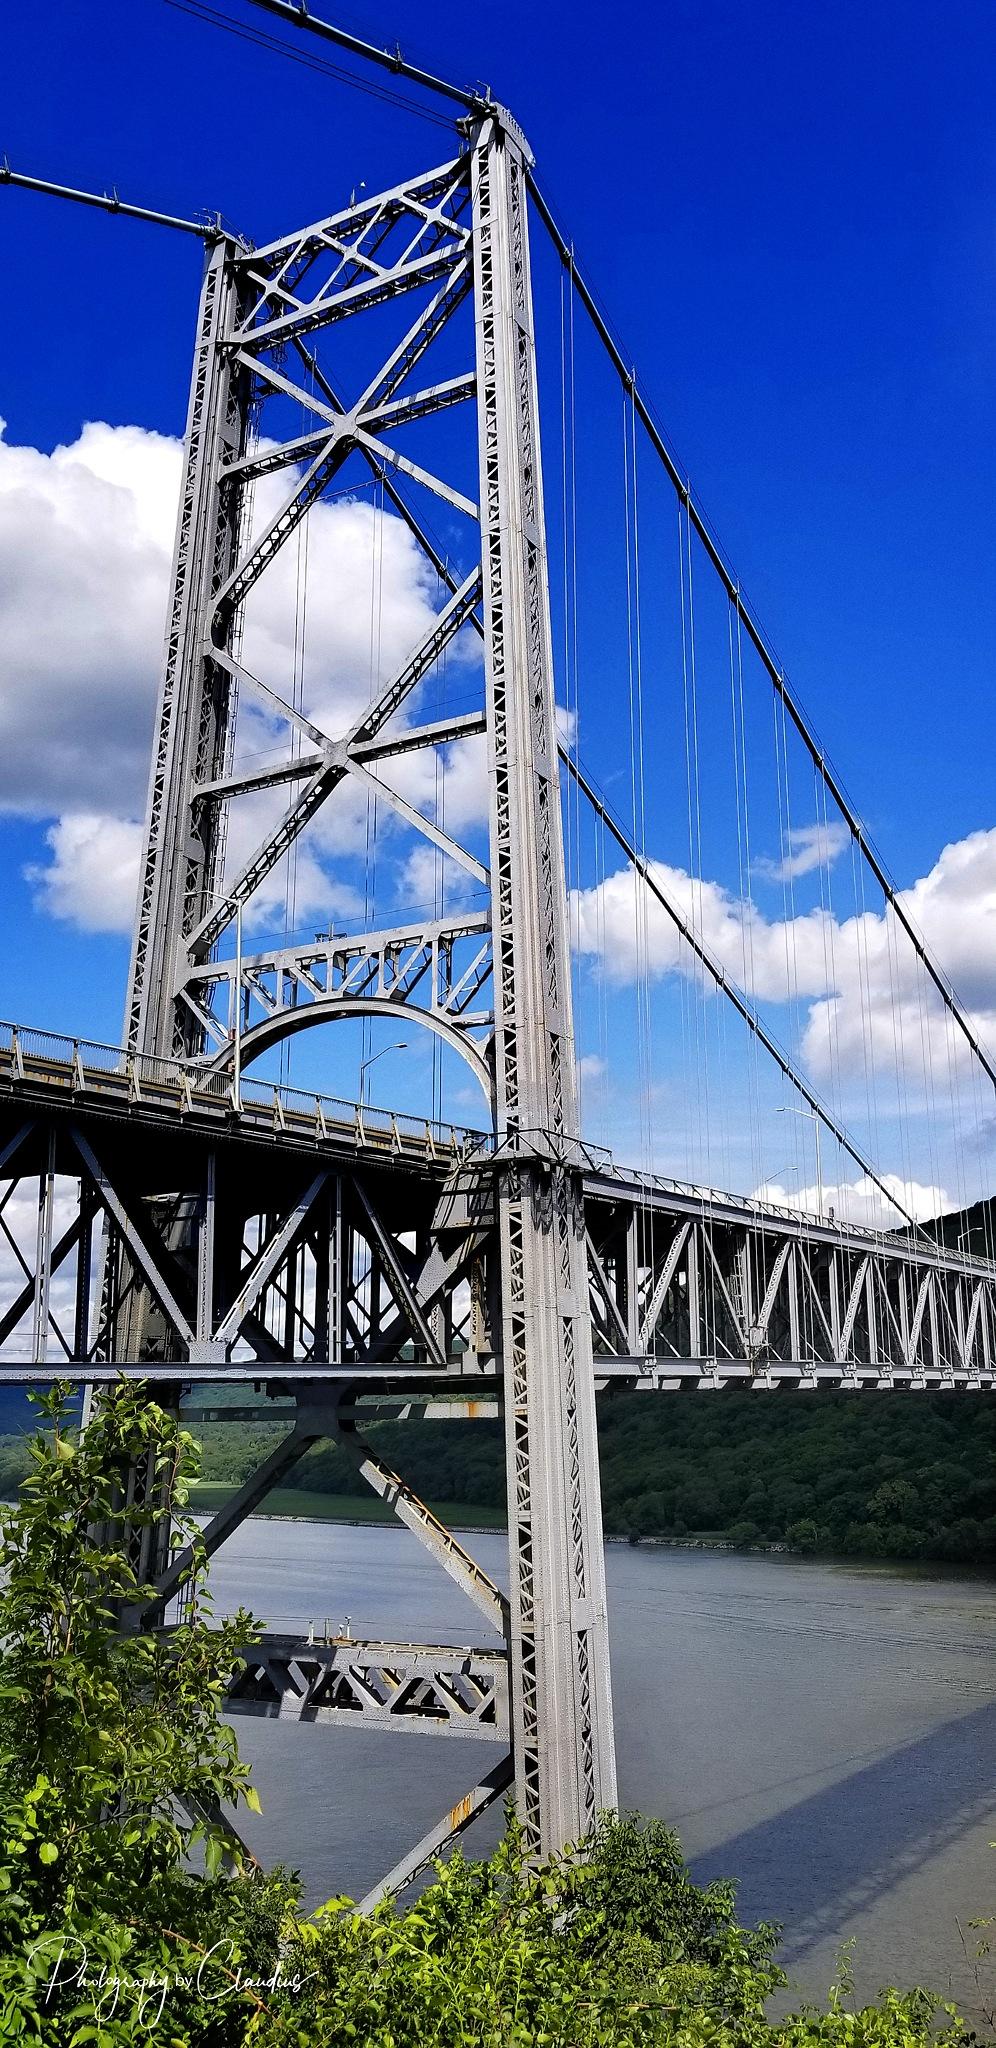 The Bear Mountain Bridge by Claudius Cazan